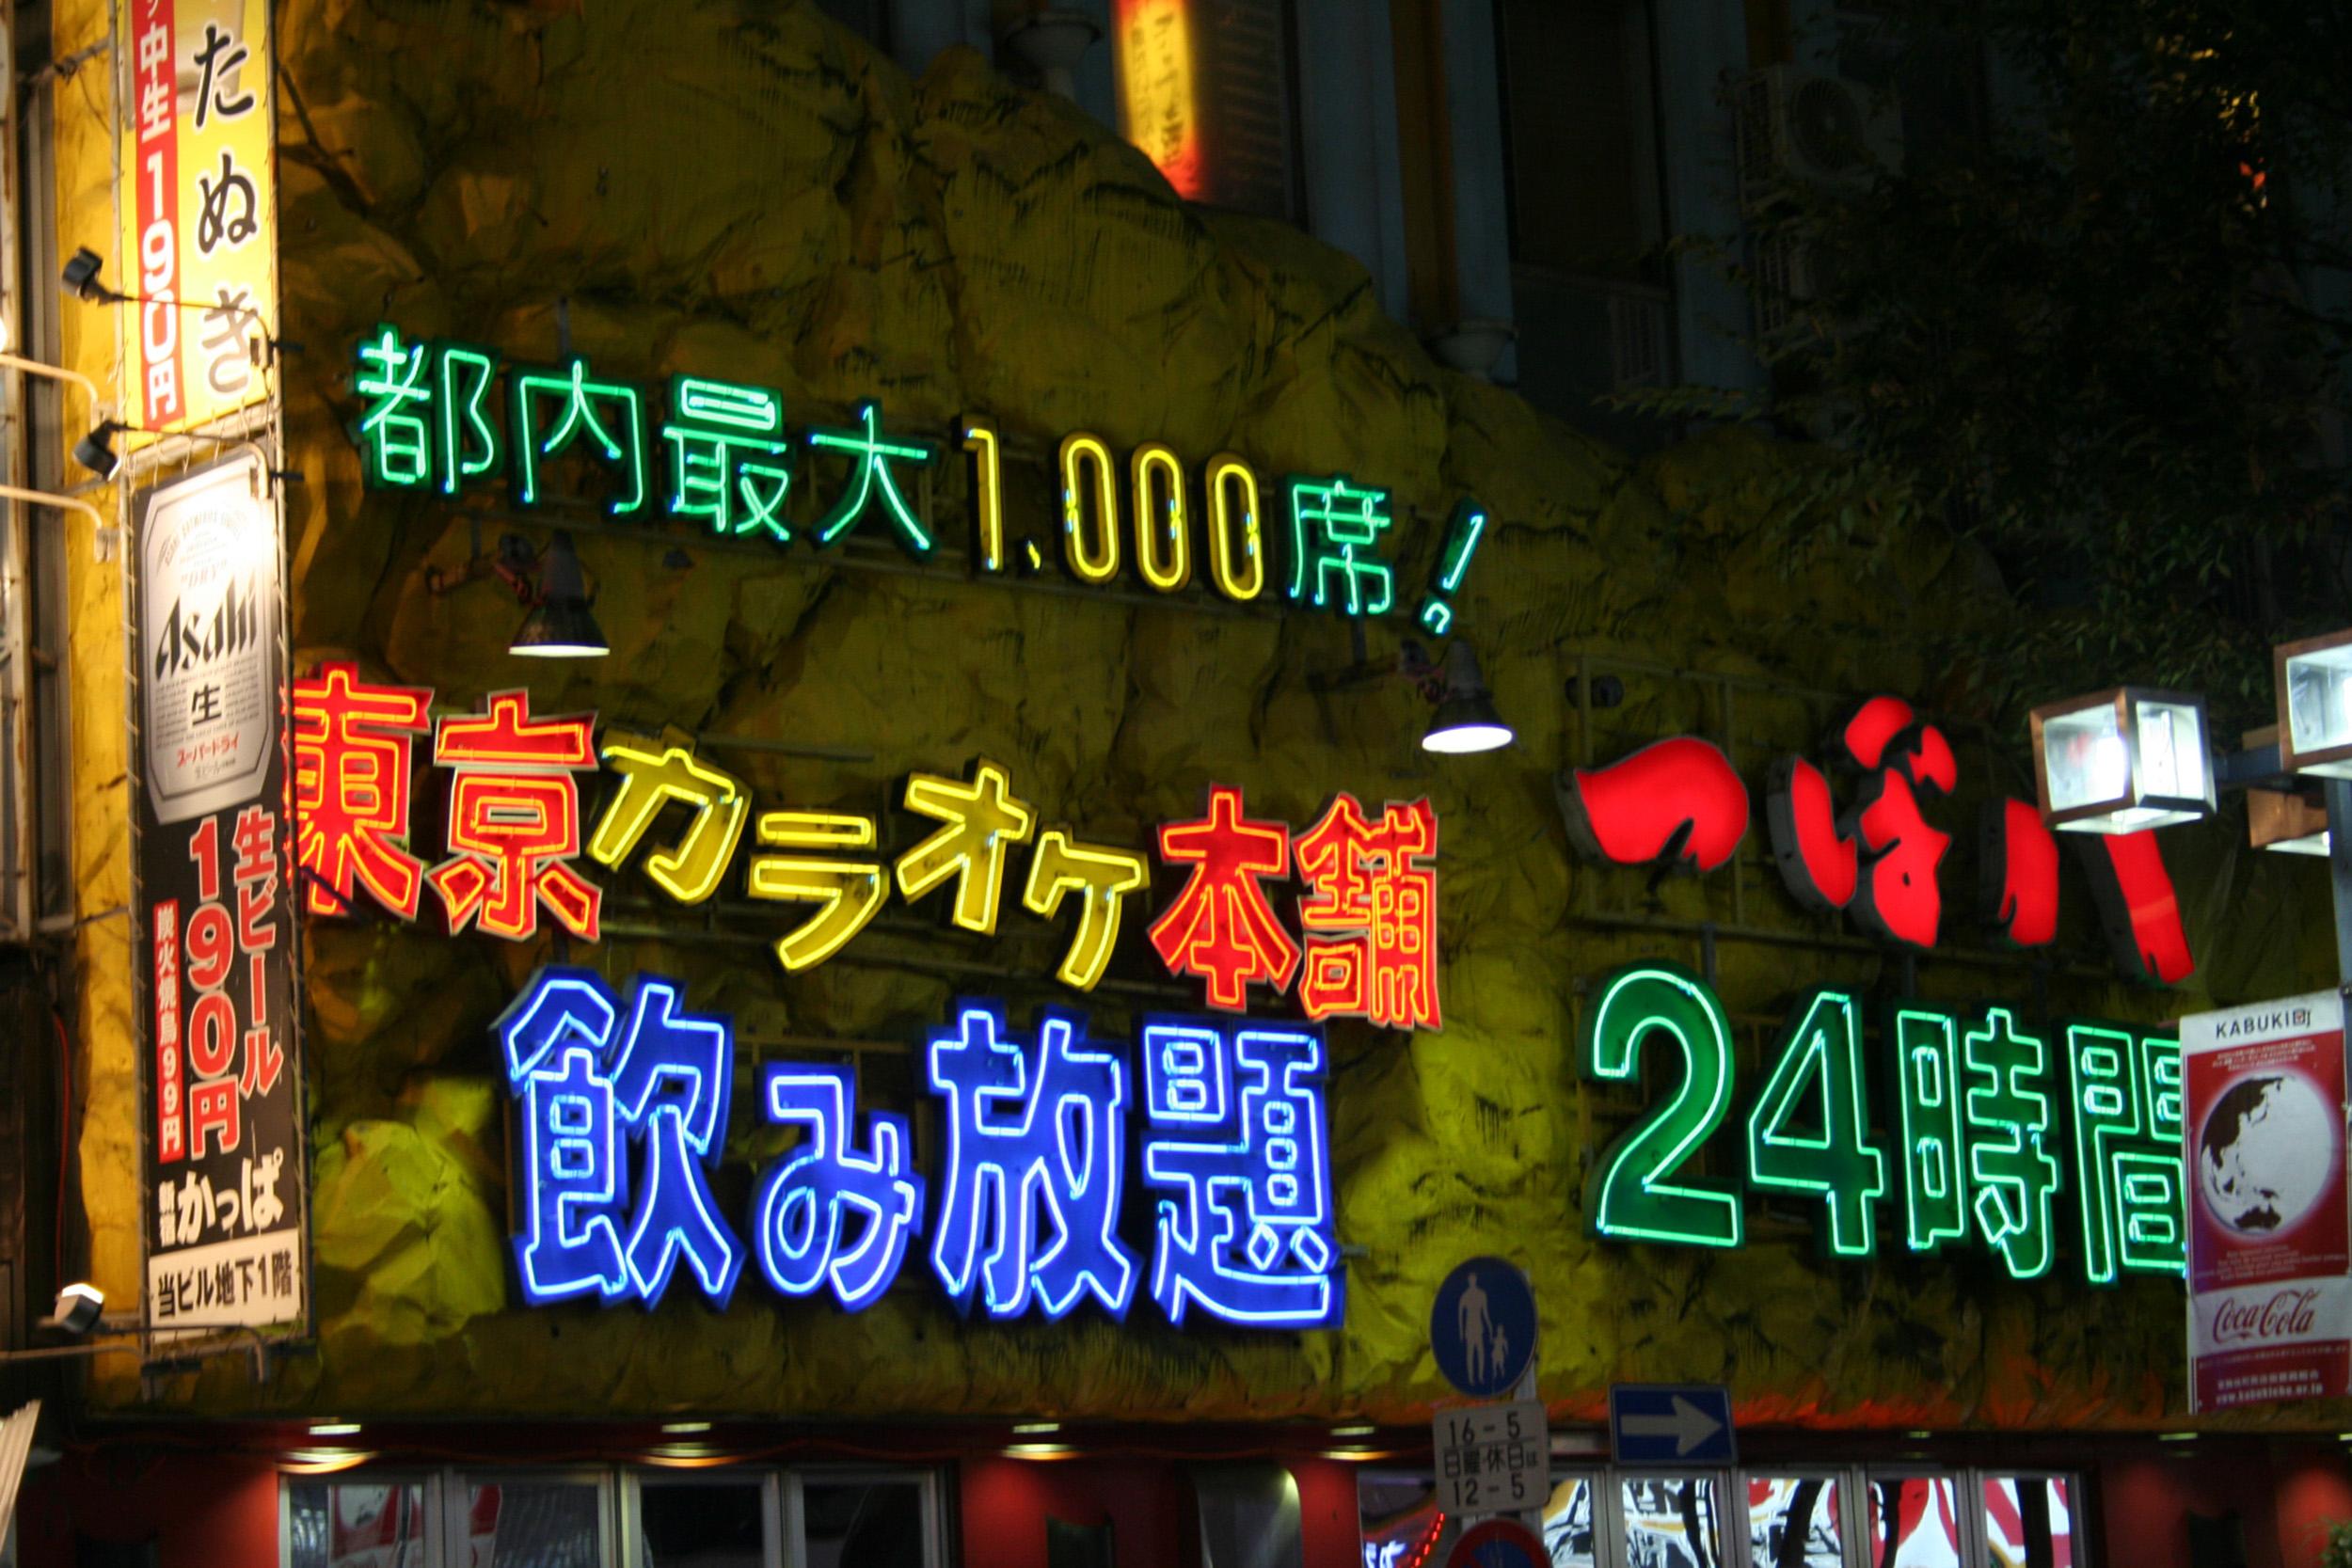 On location - Tokyo, Japan